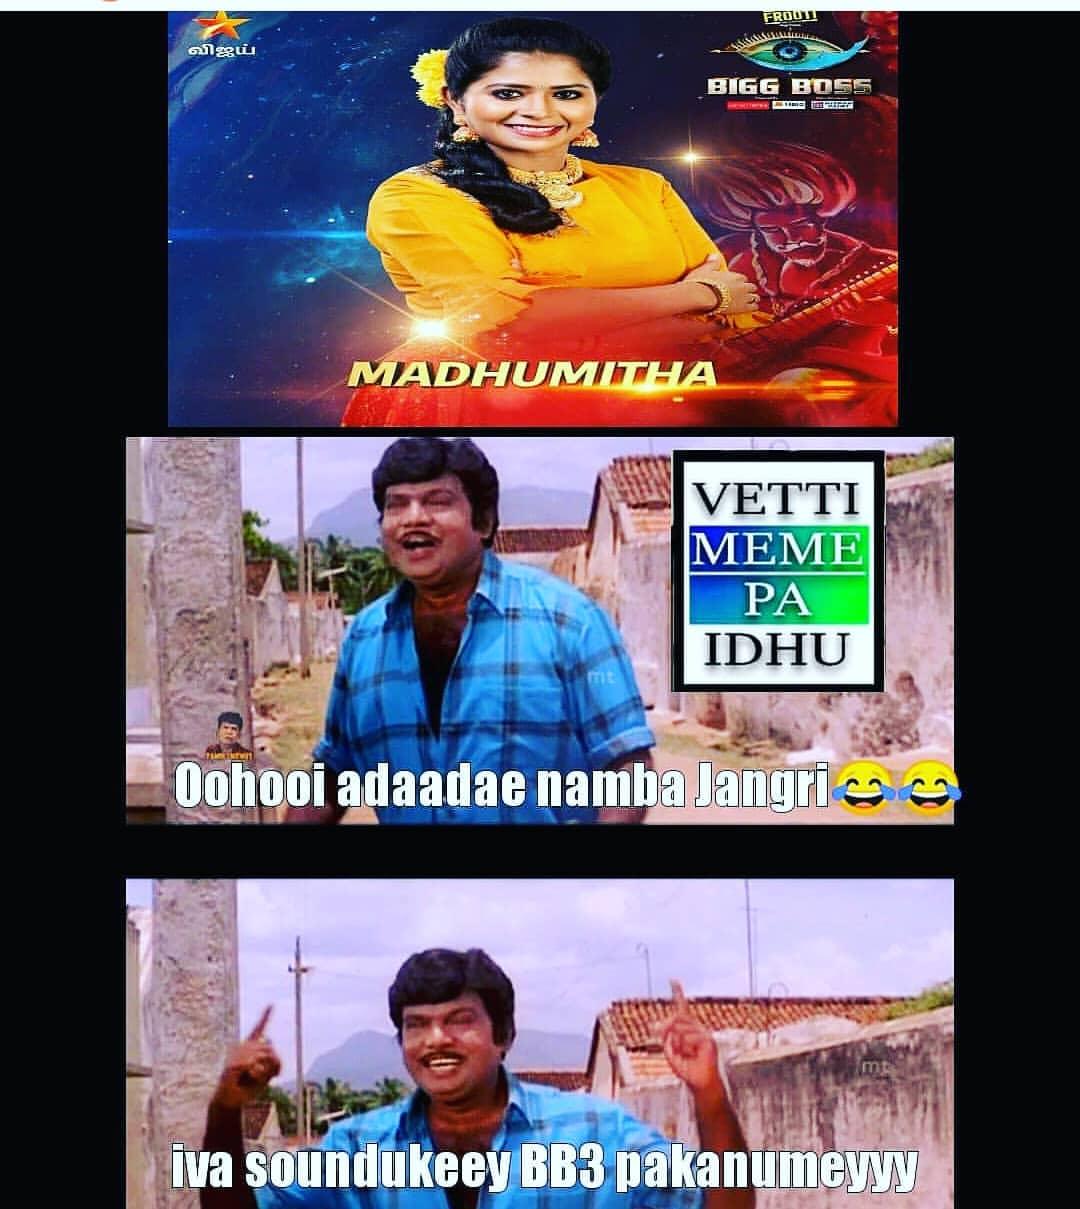 6+ Funny Bigg boss tamil season 3 Contestant Madhumitha Memes